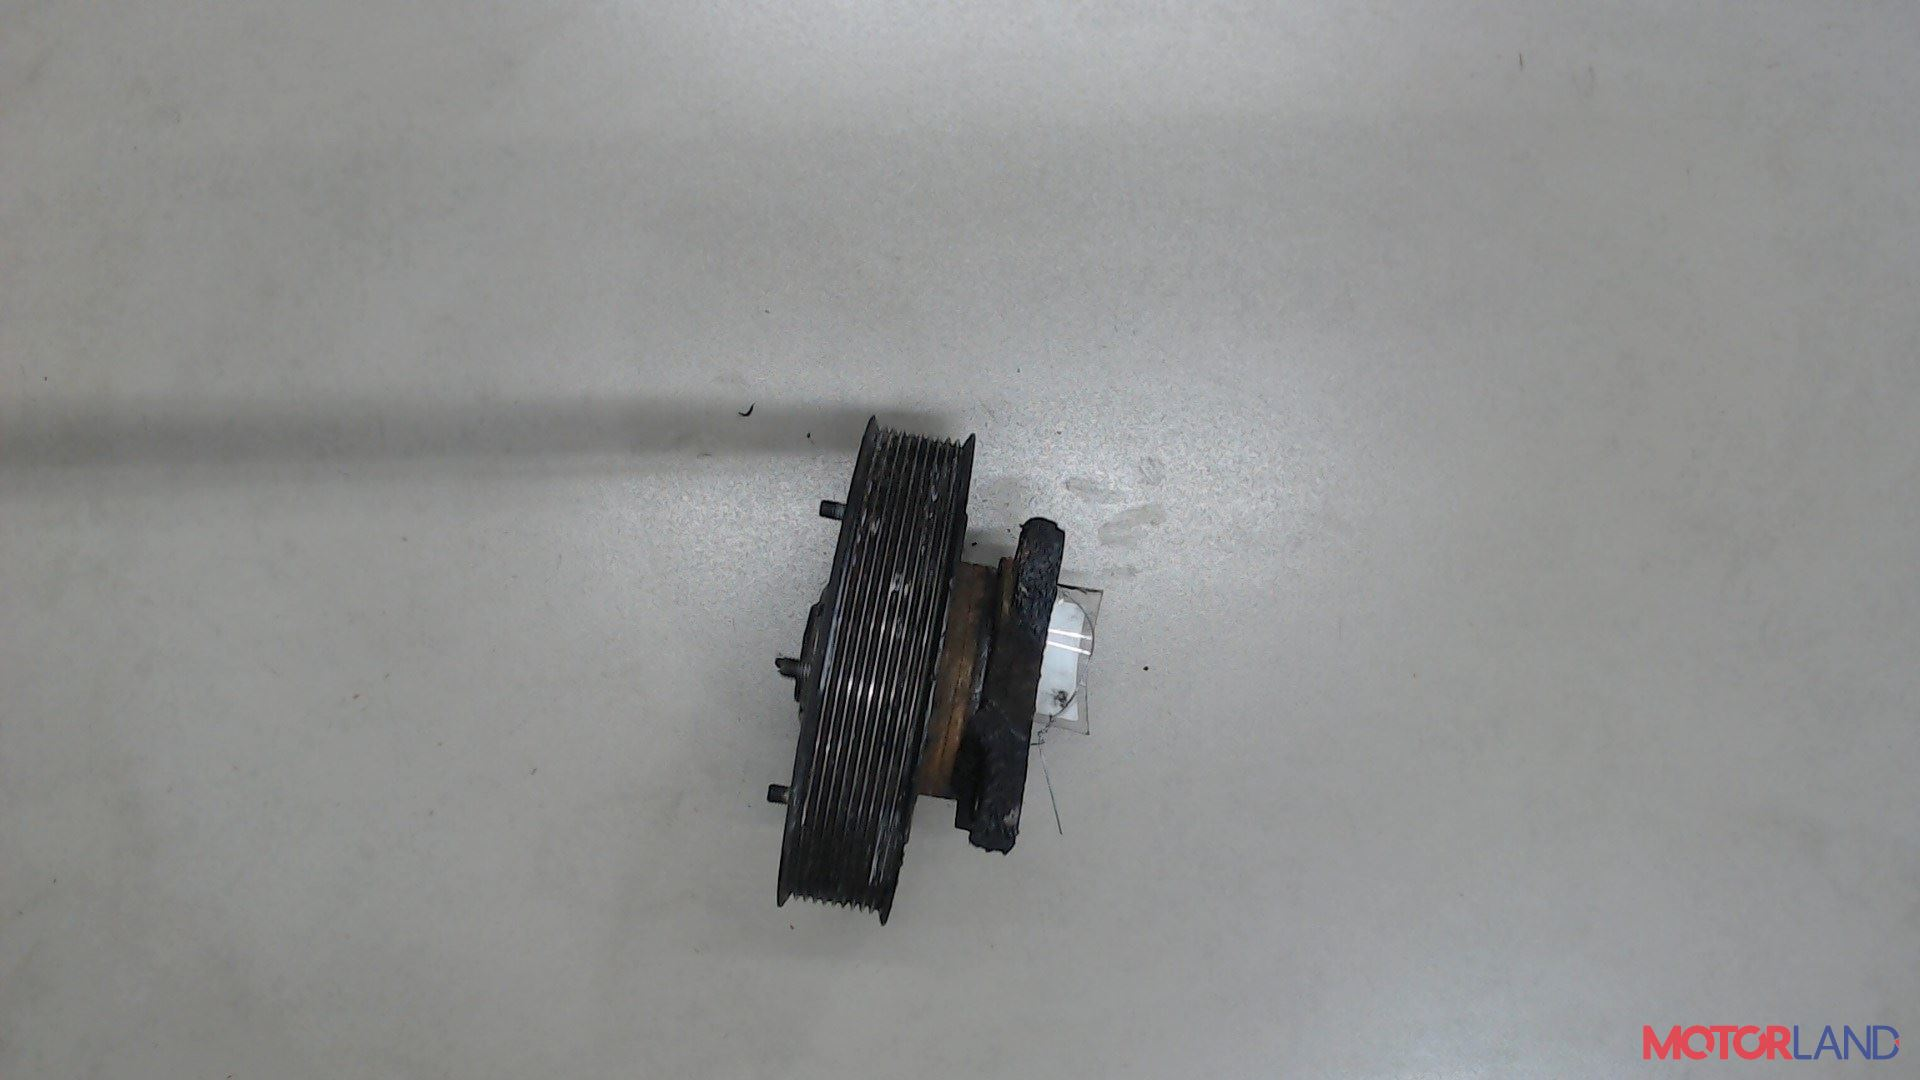 Ступица вентилятора / кронштейн вискомуфты Renault Magnum DXI 2006-2013 12 л. 2006 DXI 12 480 б/у #2